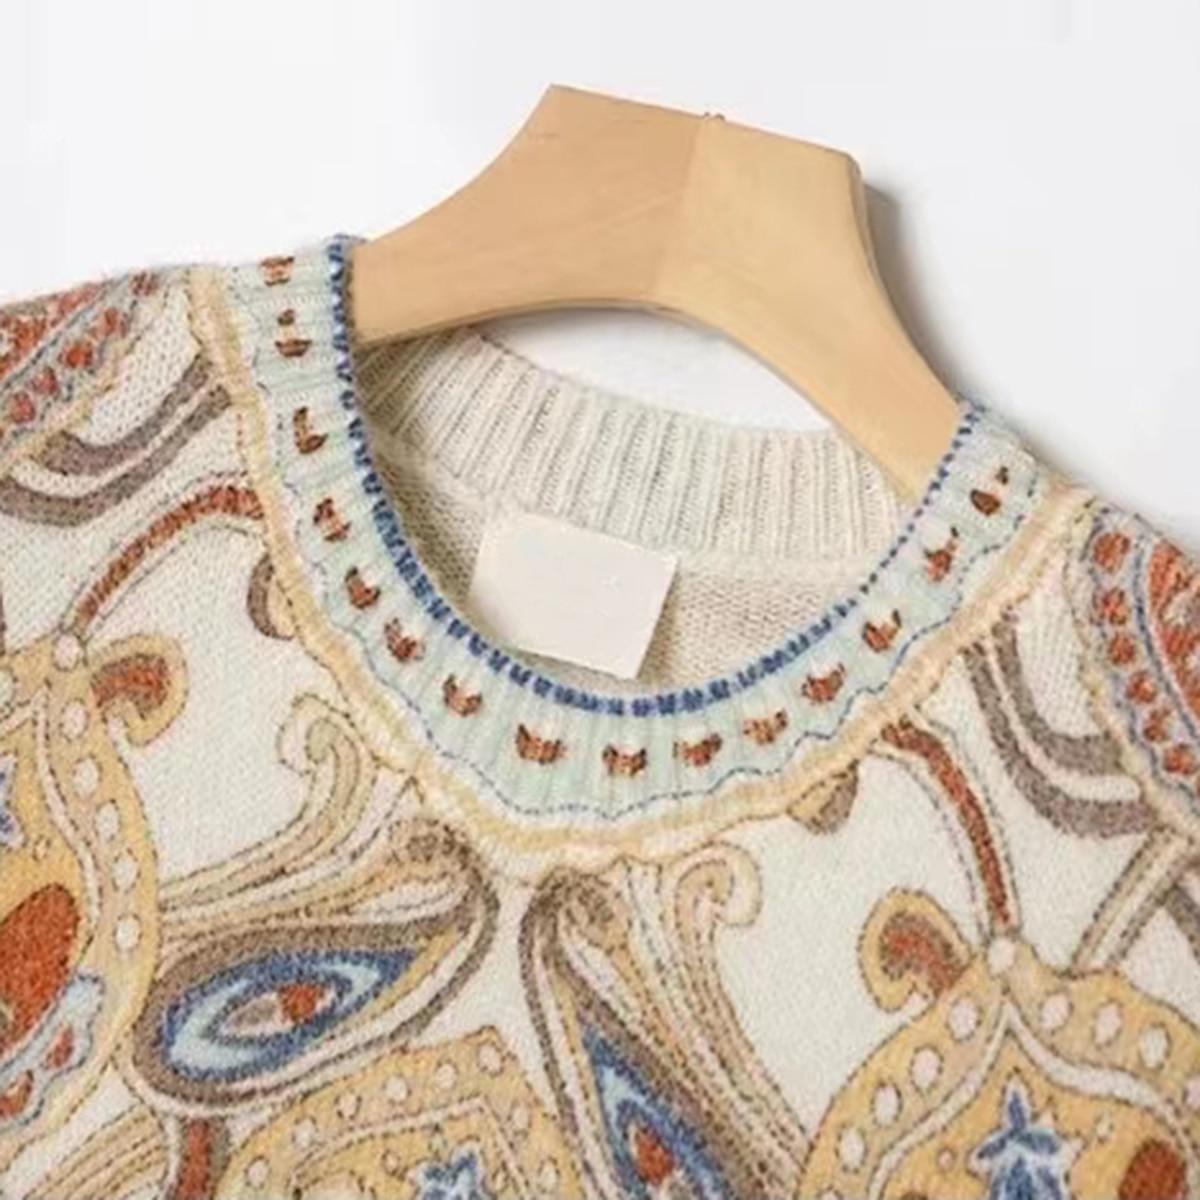 Multicoloured Print Sweater Women 2021 Autumn Winter Round Neck Long Sleeve Jumpers Tops Female Vinatge Elegant Mohair Pullover enlarge